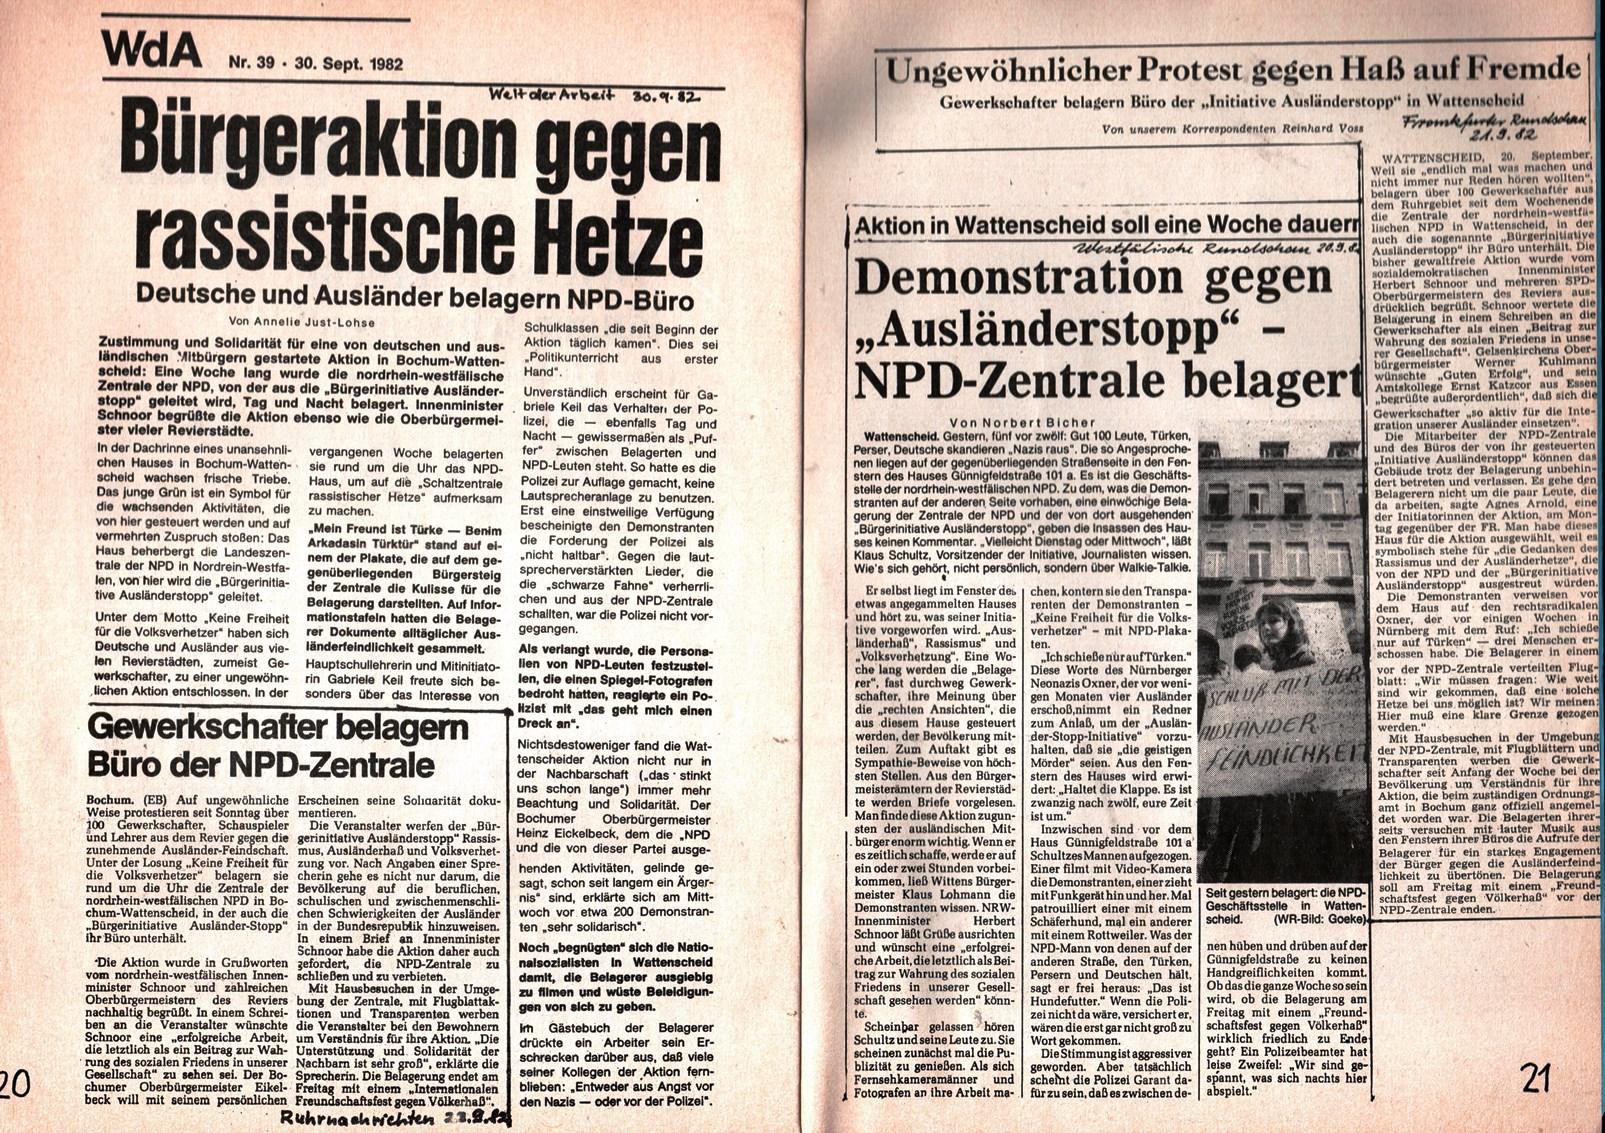 Bochum_1982_BI_Auslaenderstopp_belagern_013